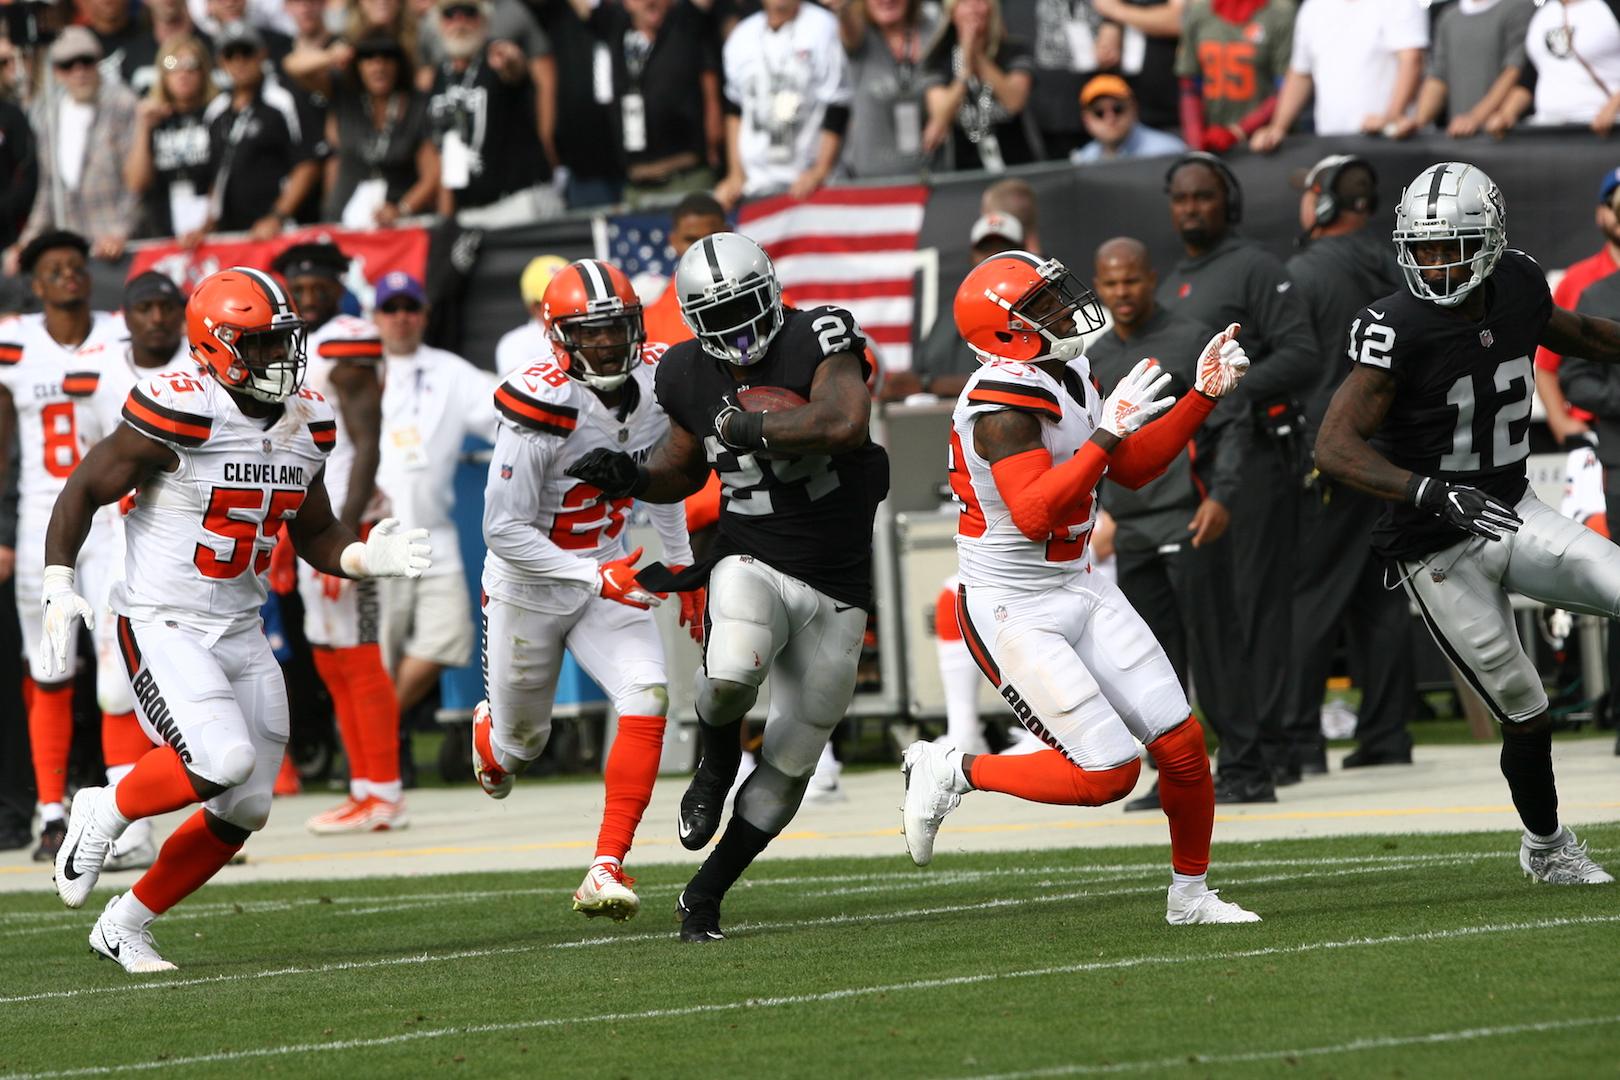 _Browns vs Raiders_09-30-18 0412